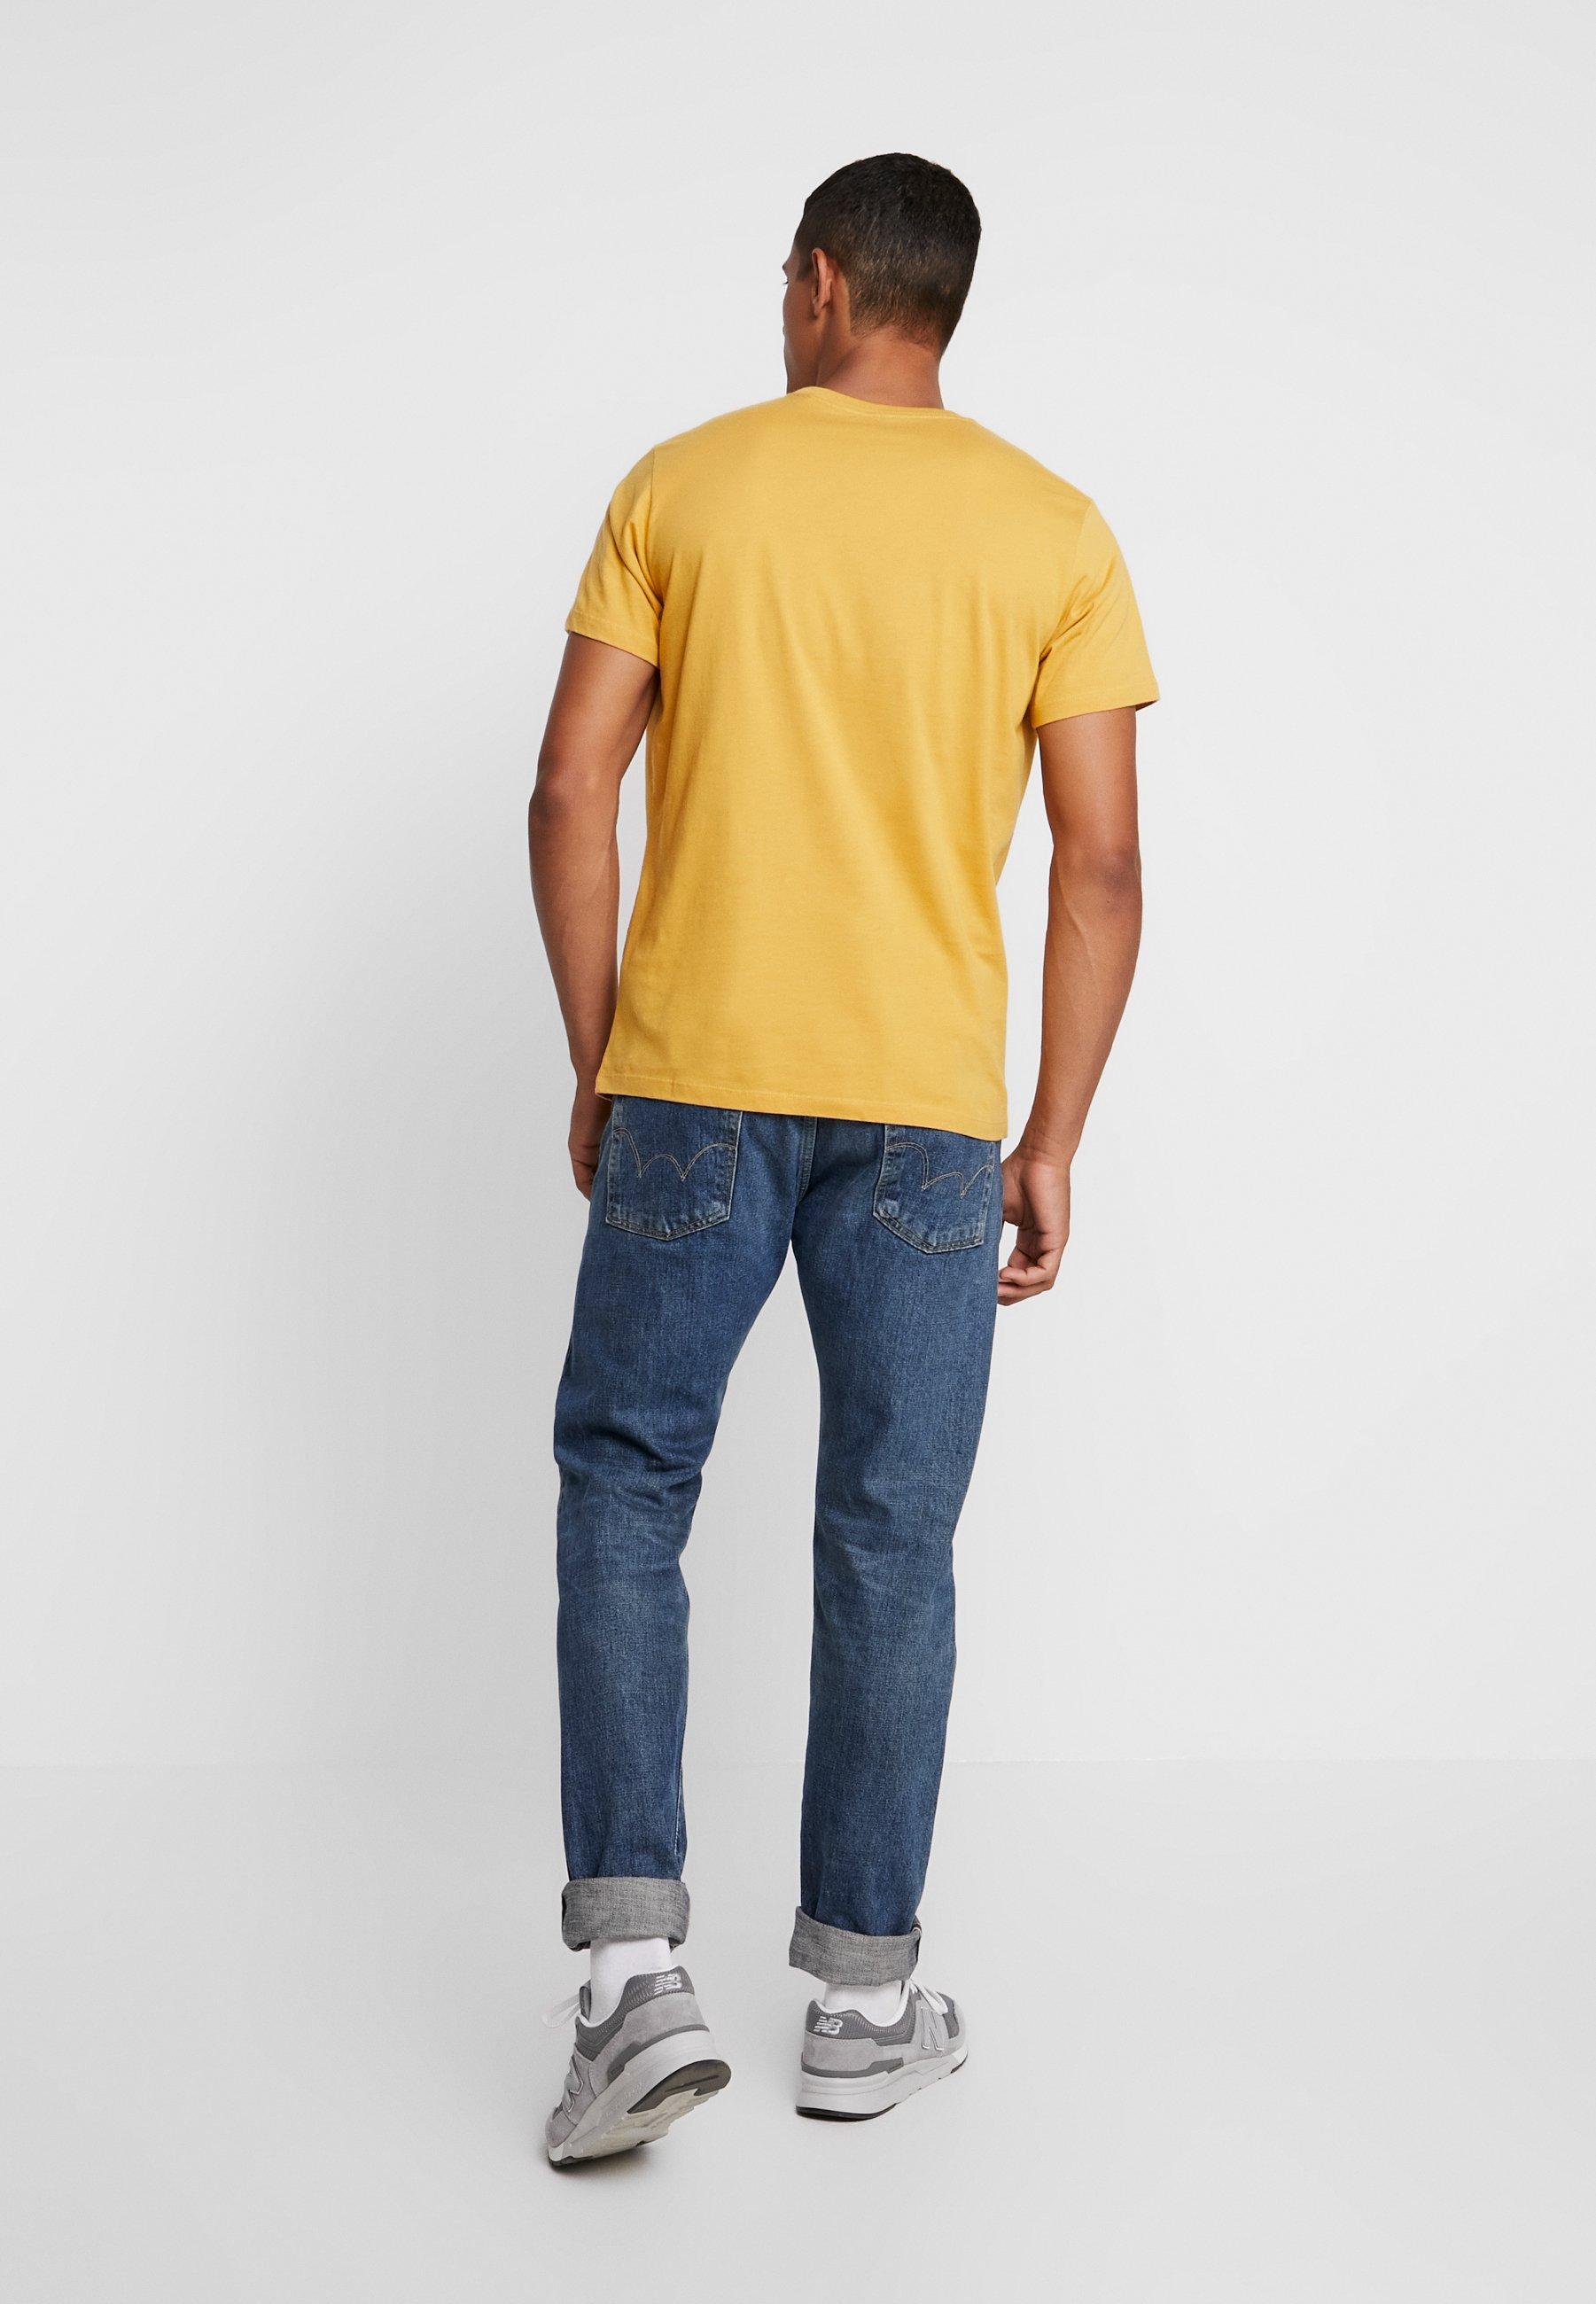 ochre print Pepe EGGOT orange Jeans Shirt nOP0wk